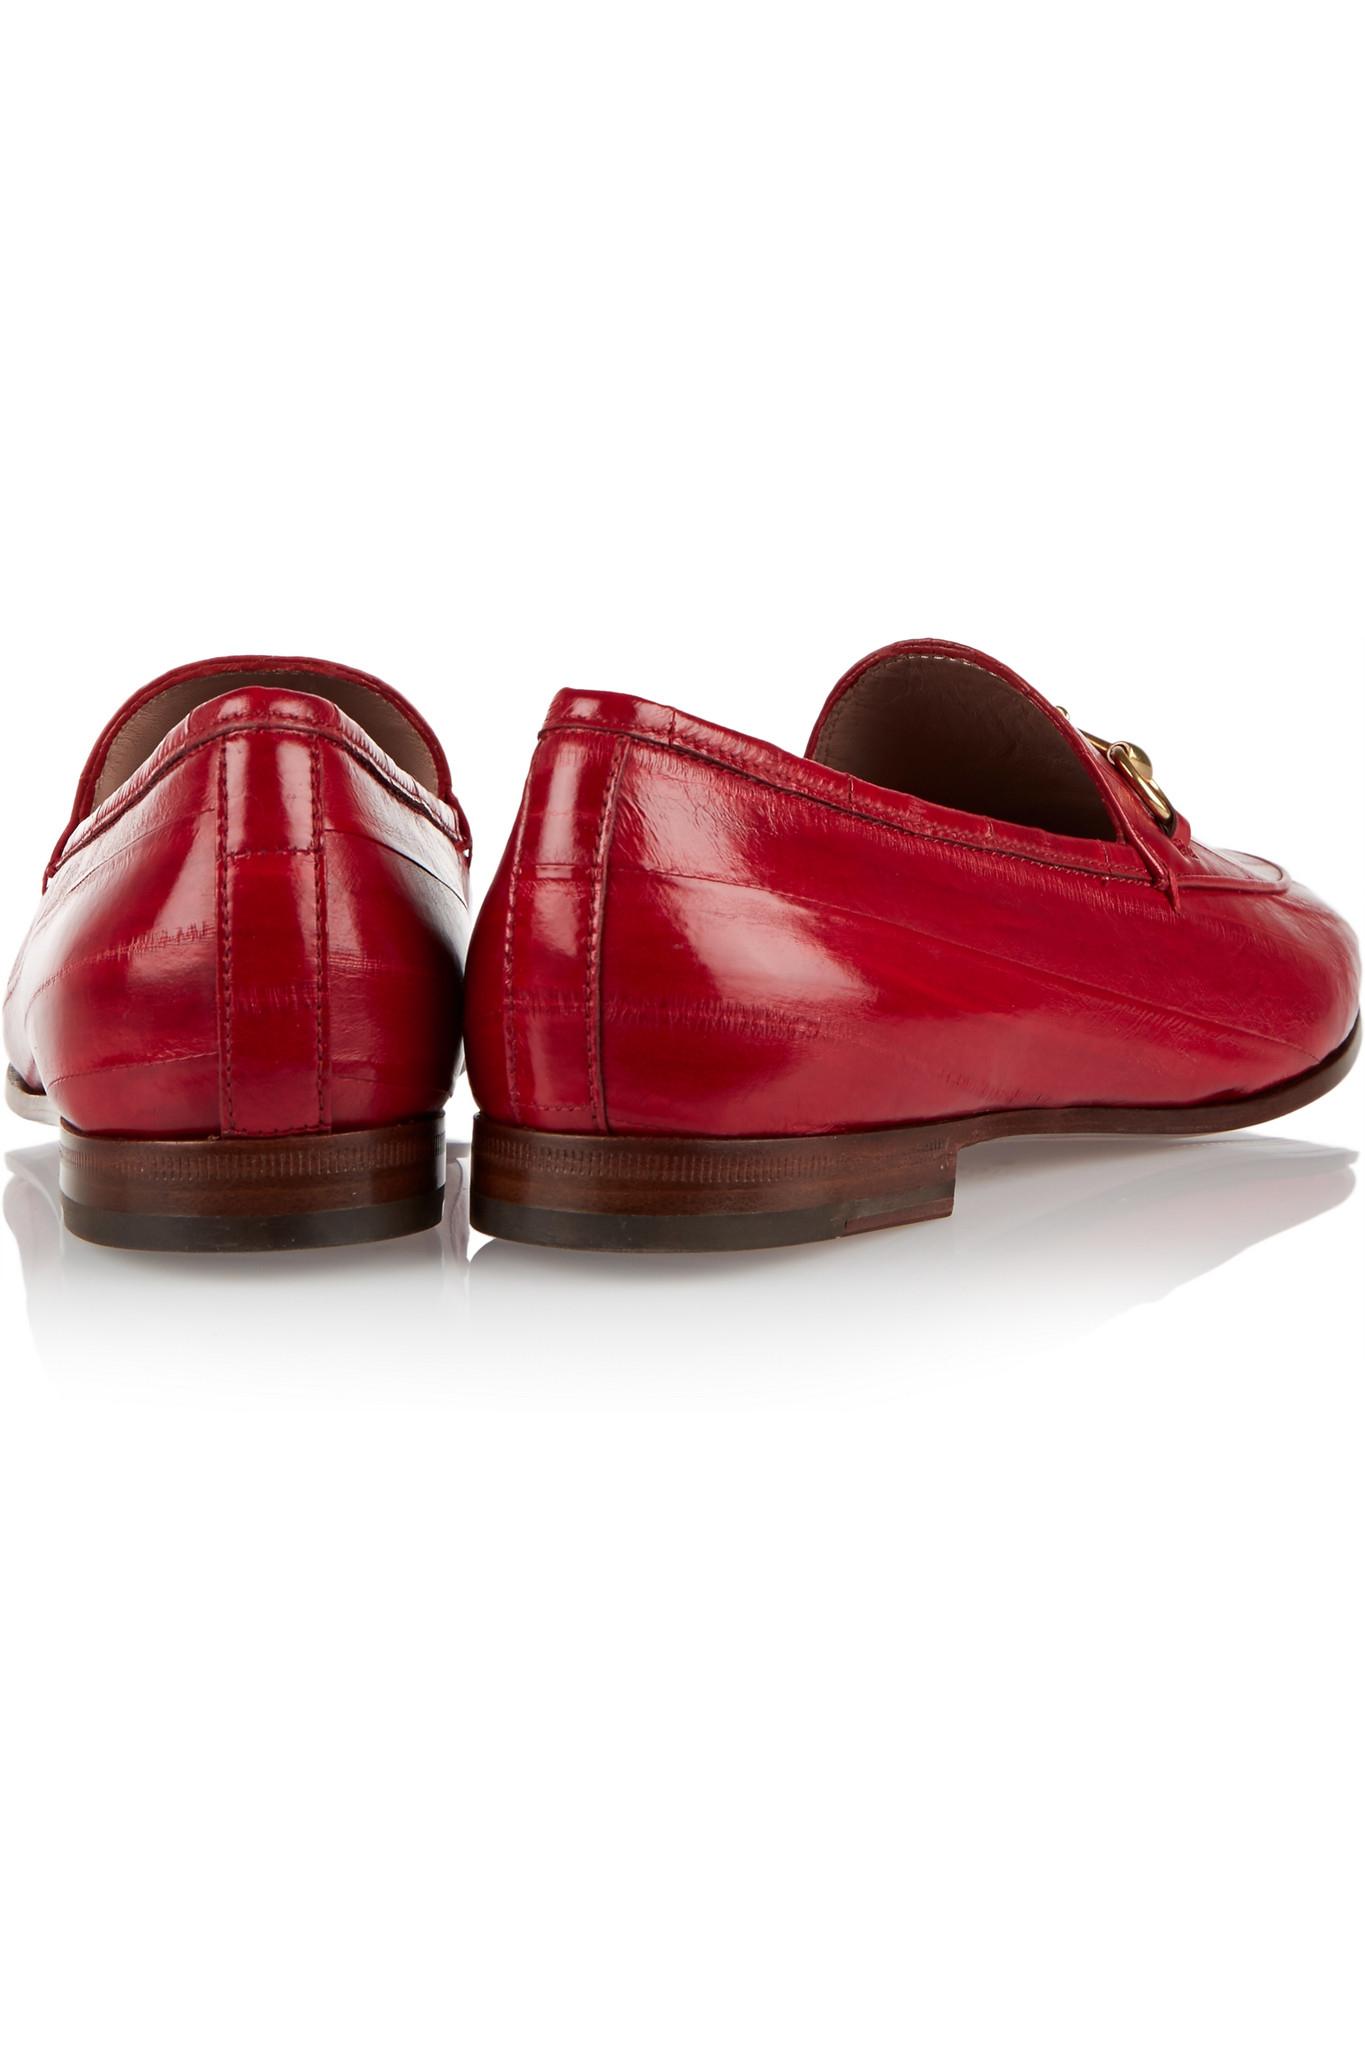 c35153f99de Gucci Horsebit-detailed Eel Loafers in Red - Lyst